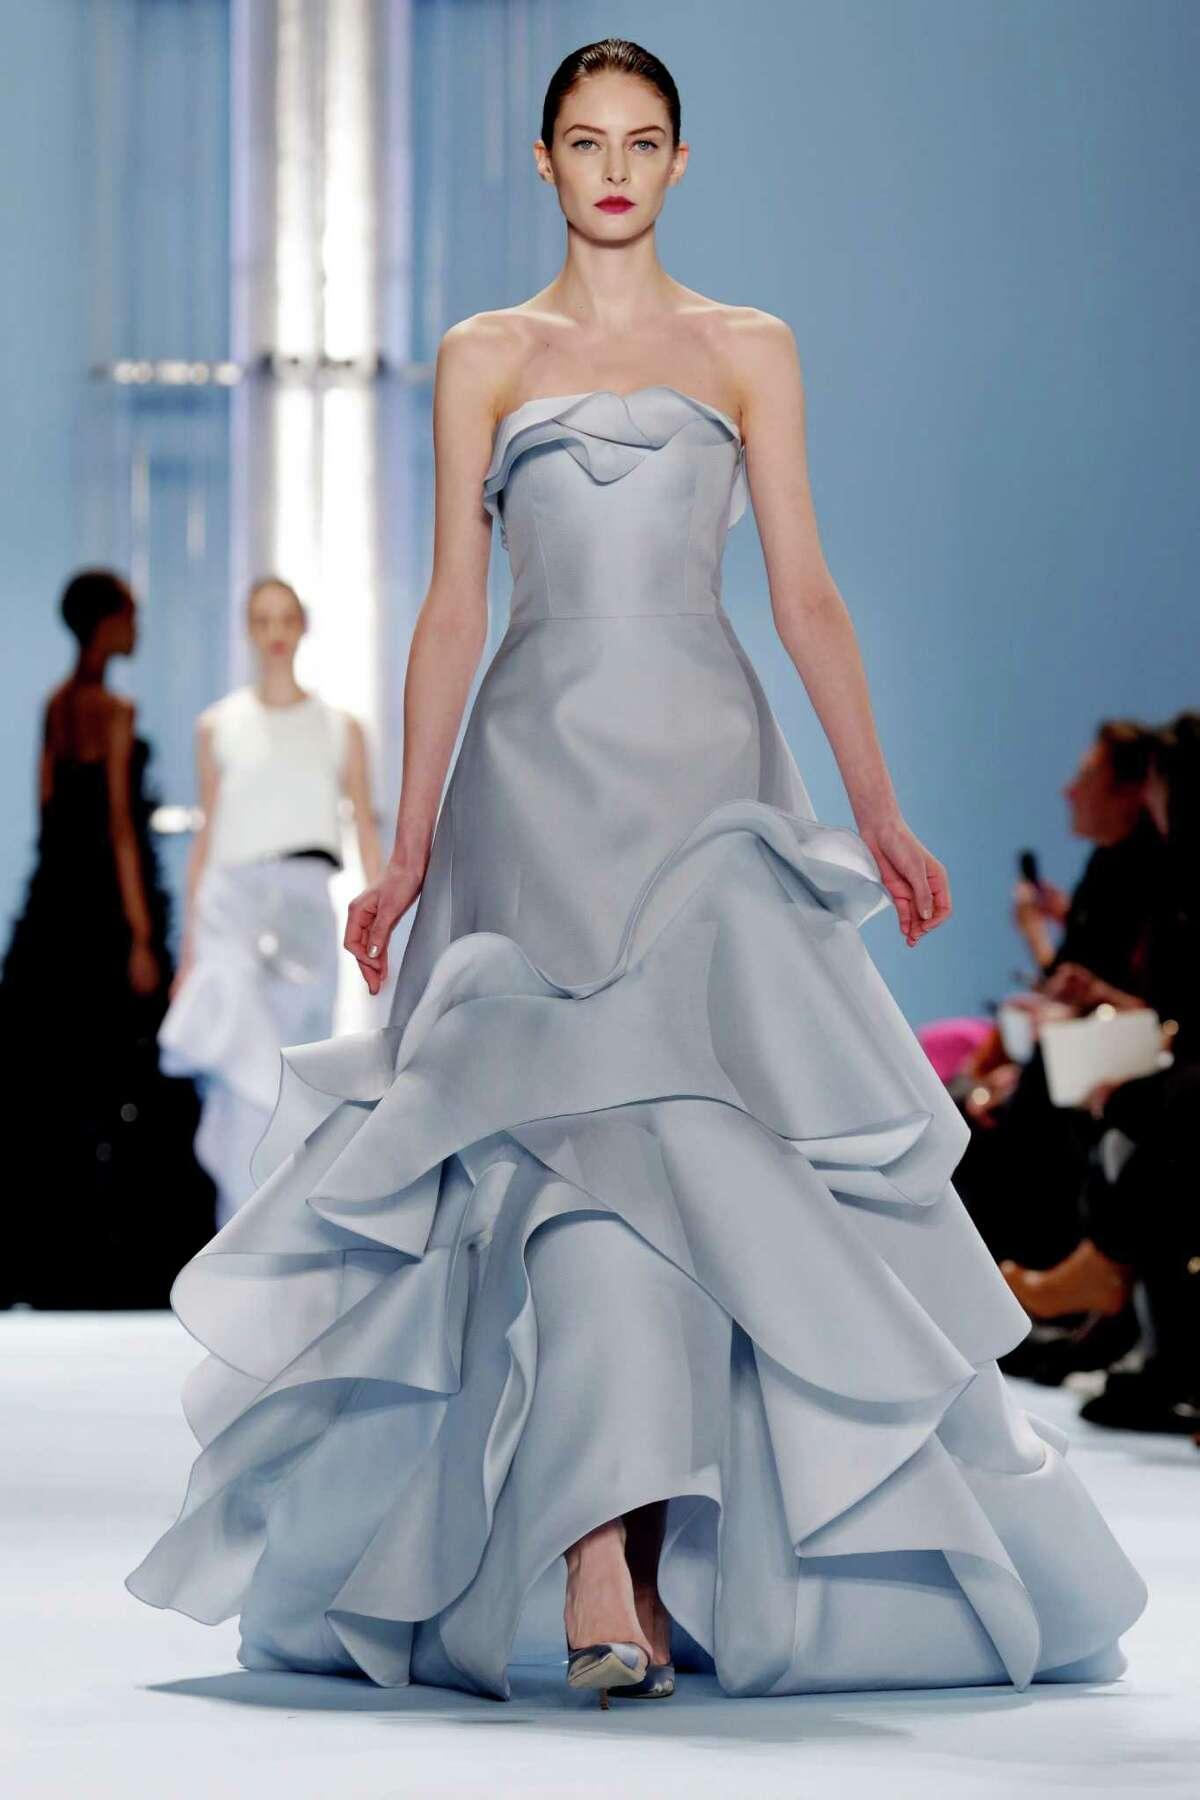 Favorite designer: Carolina Herrera